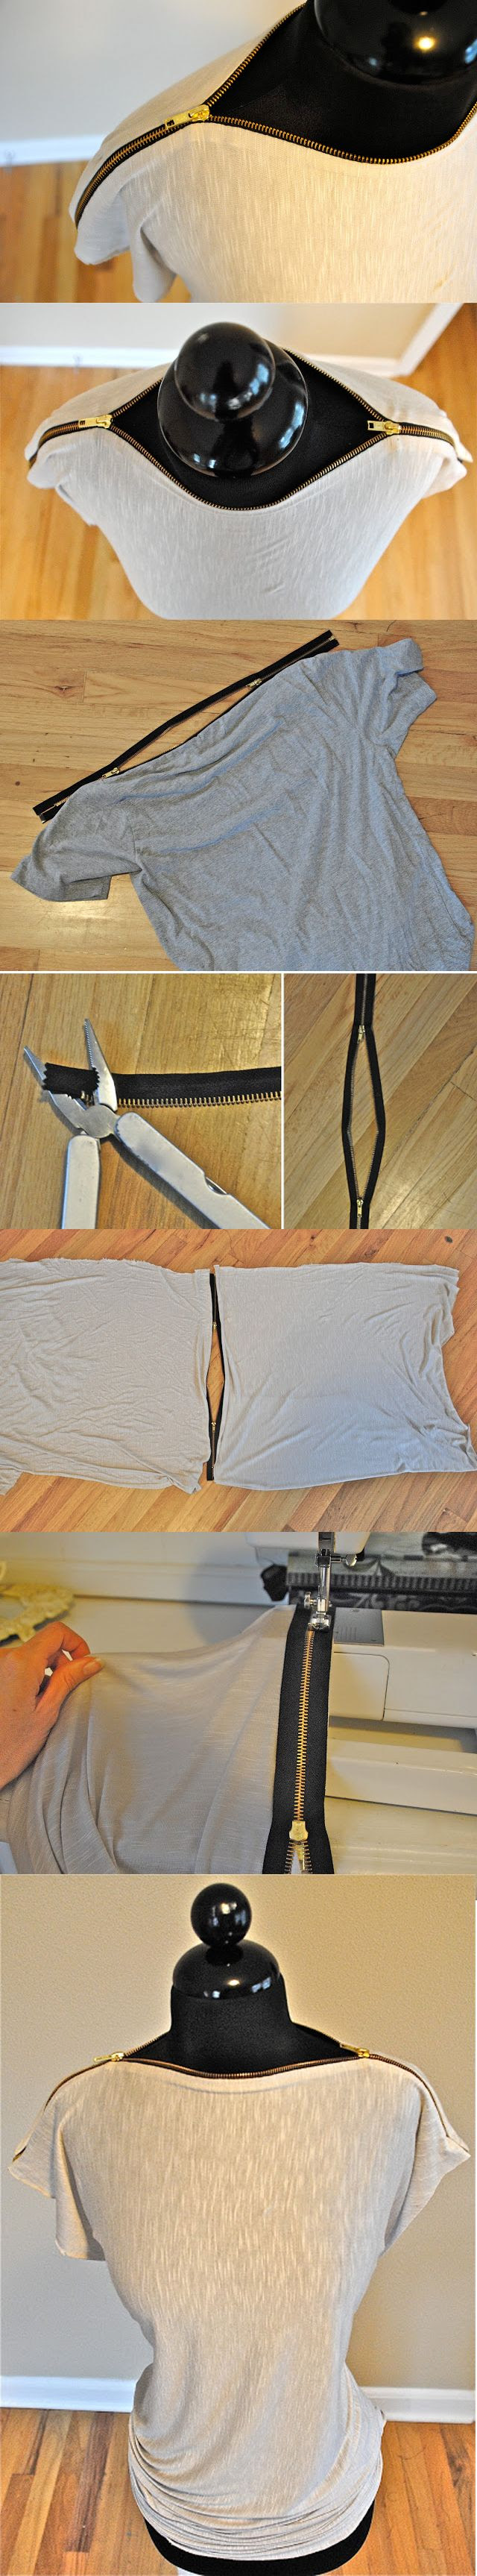 DIY: 12 Fashion Projects